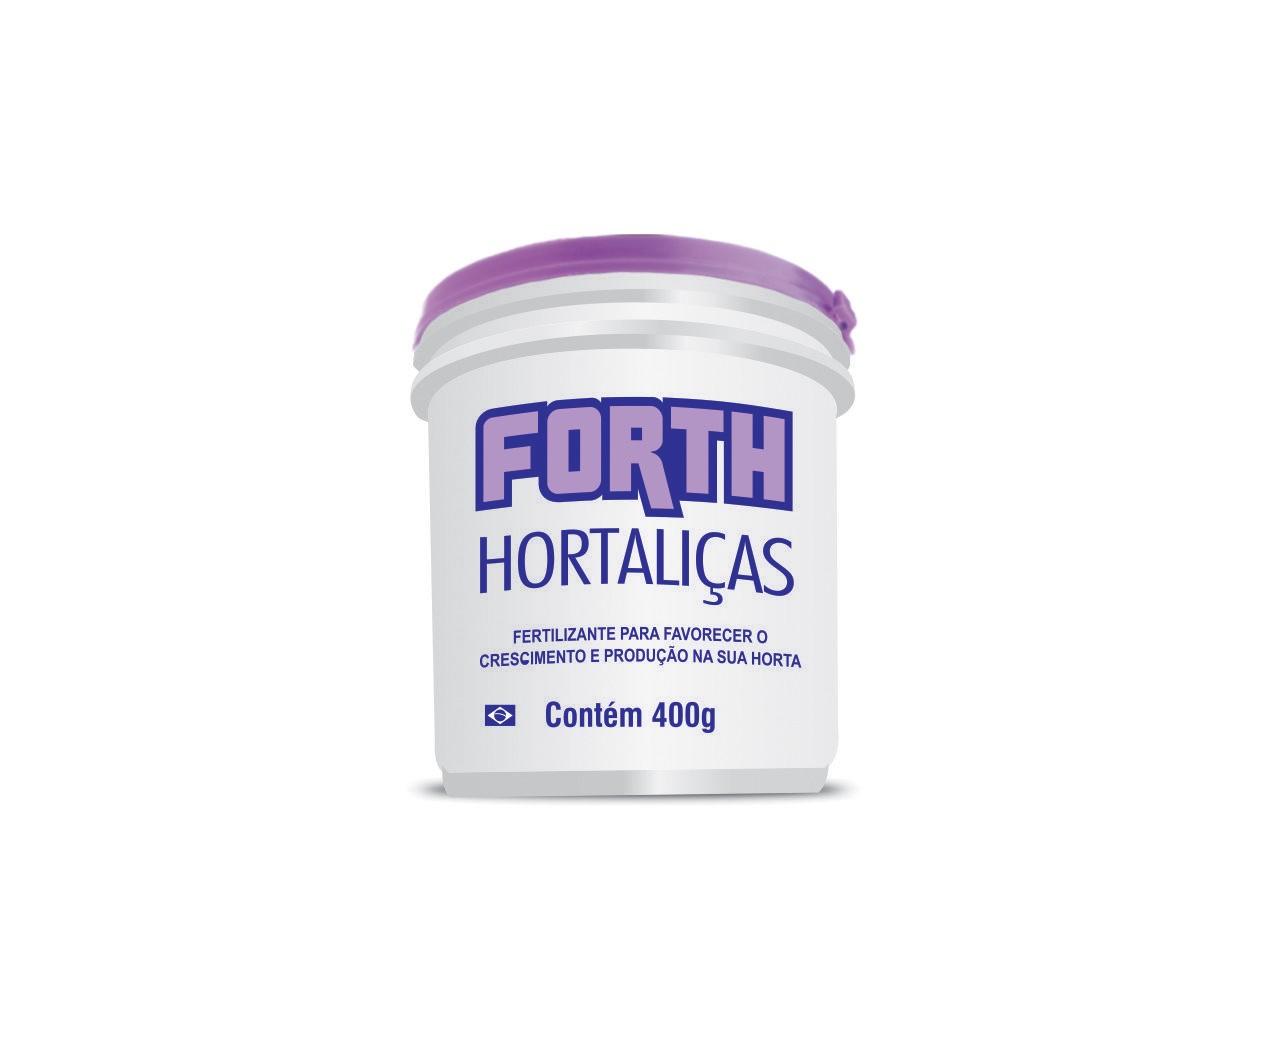 Fertilizante Forth Hortaliças 400 gramas  - Loja Raiz